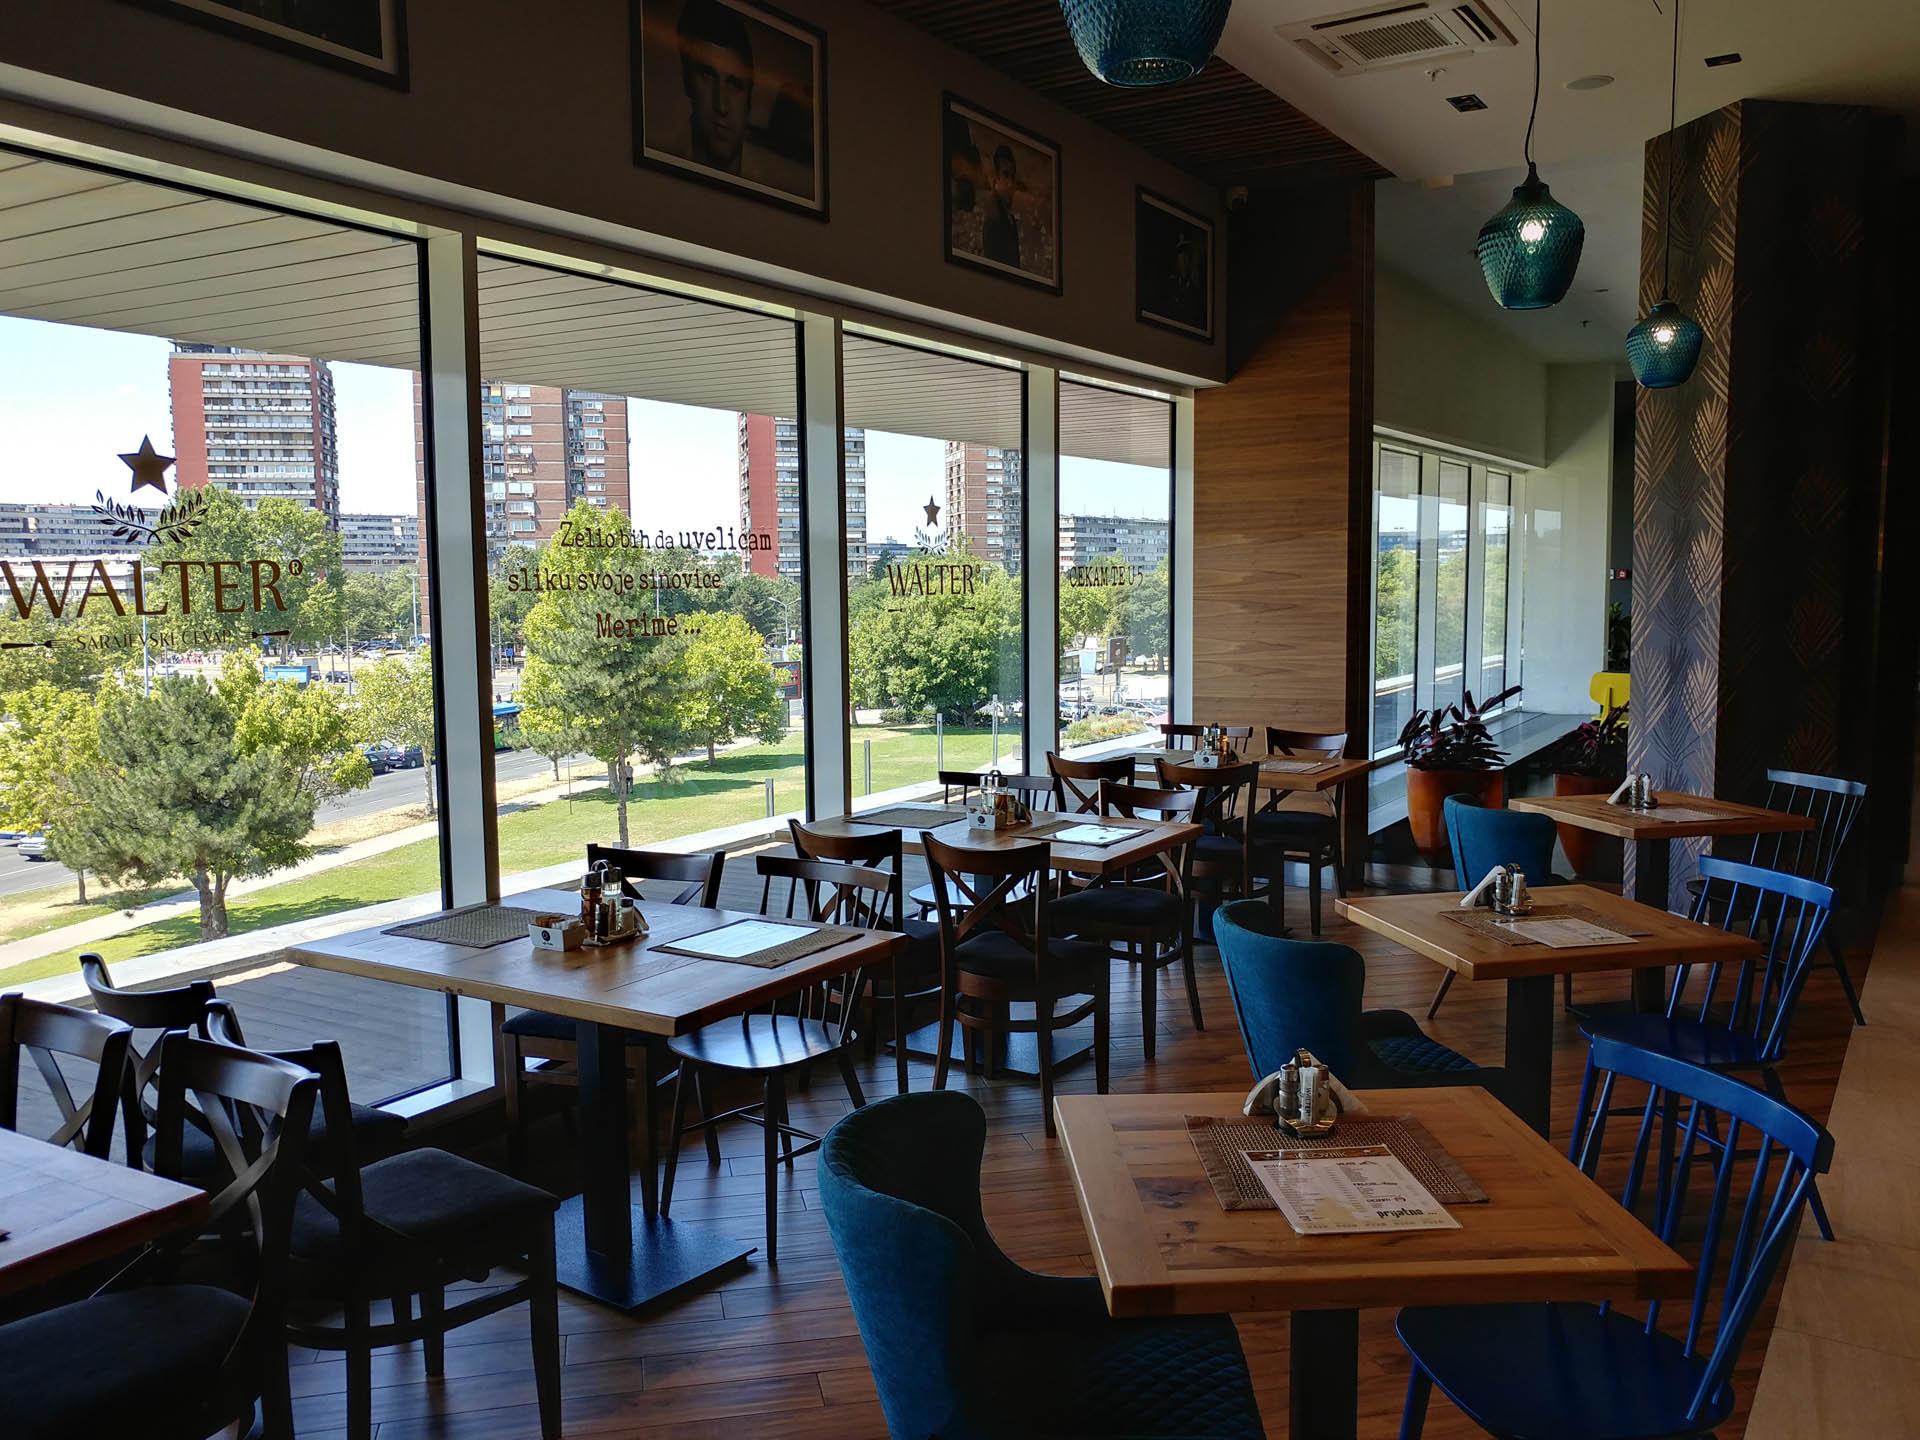 XYLON | Dizajn enterijera i nameštaja | Restoran Walter